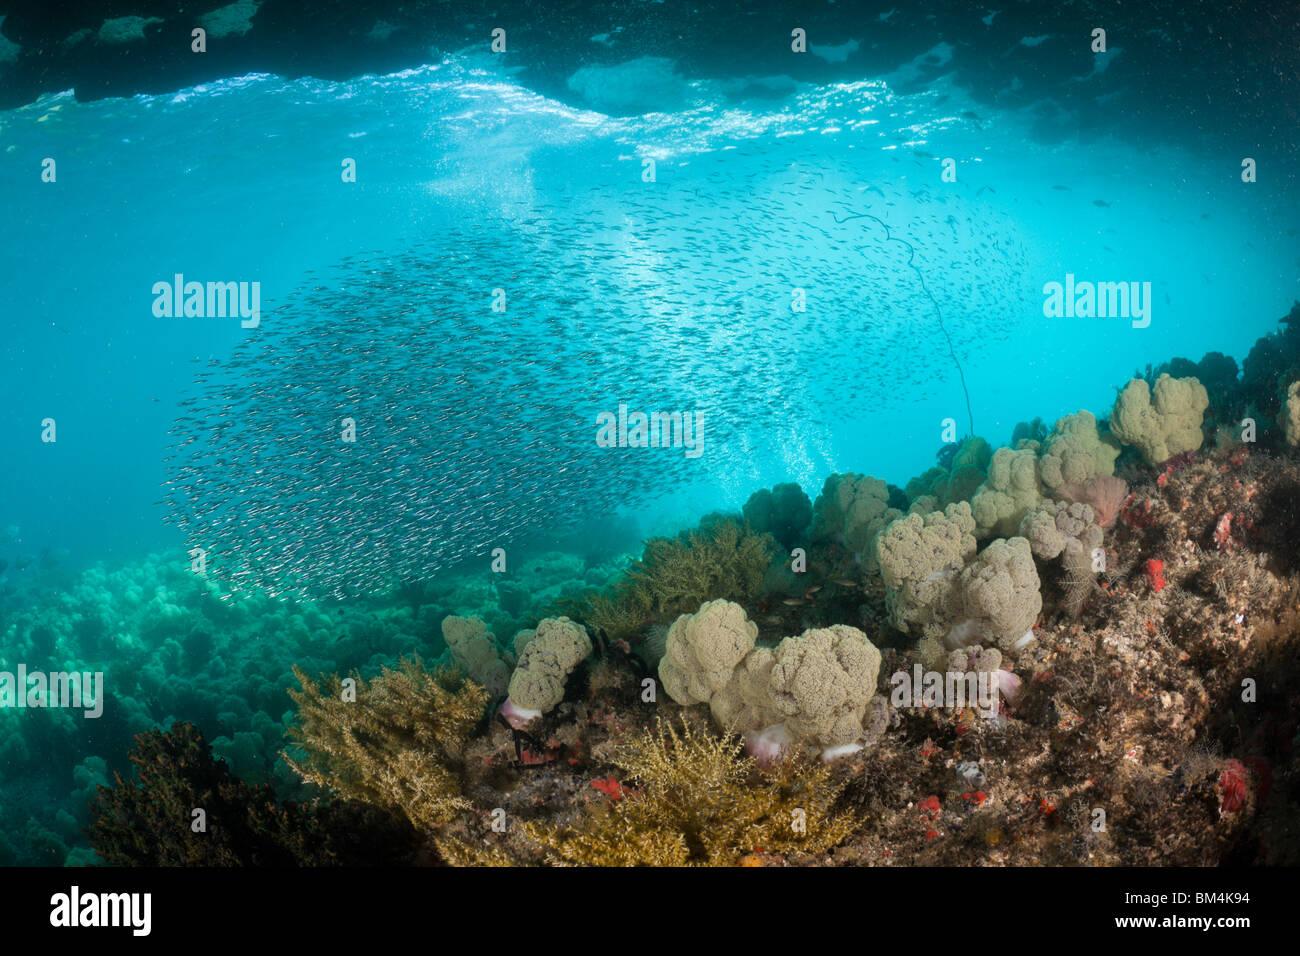 Shoal of Silversides, Atherinidae, Raja Ampat, West Papua, Indonesia - Stock Image